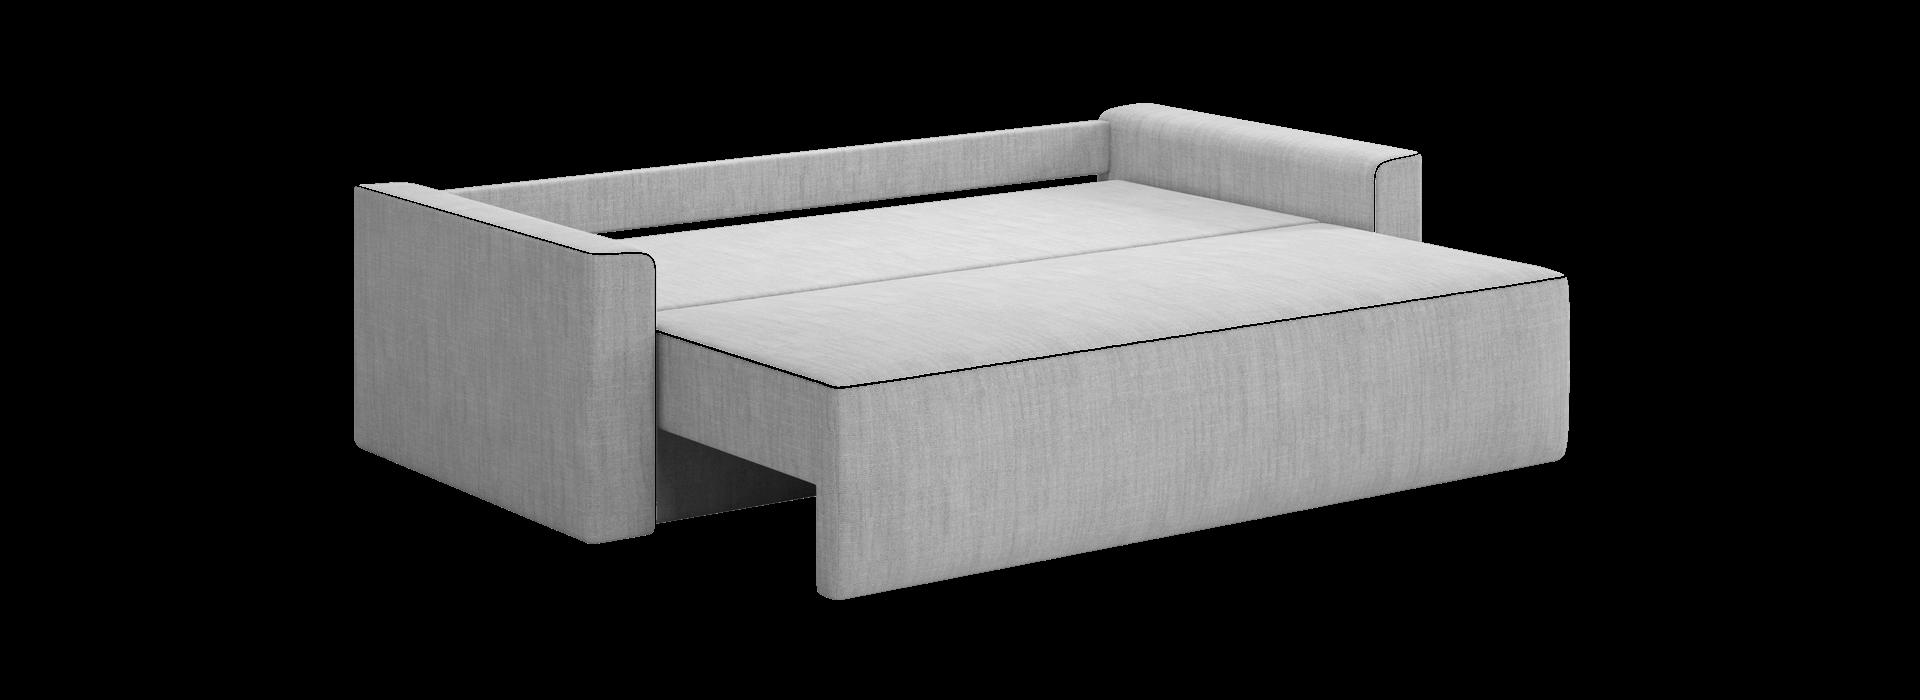 Ям-5 прямий диван - маска 3